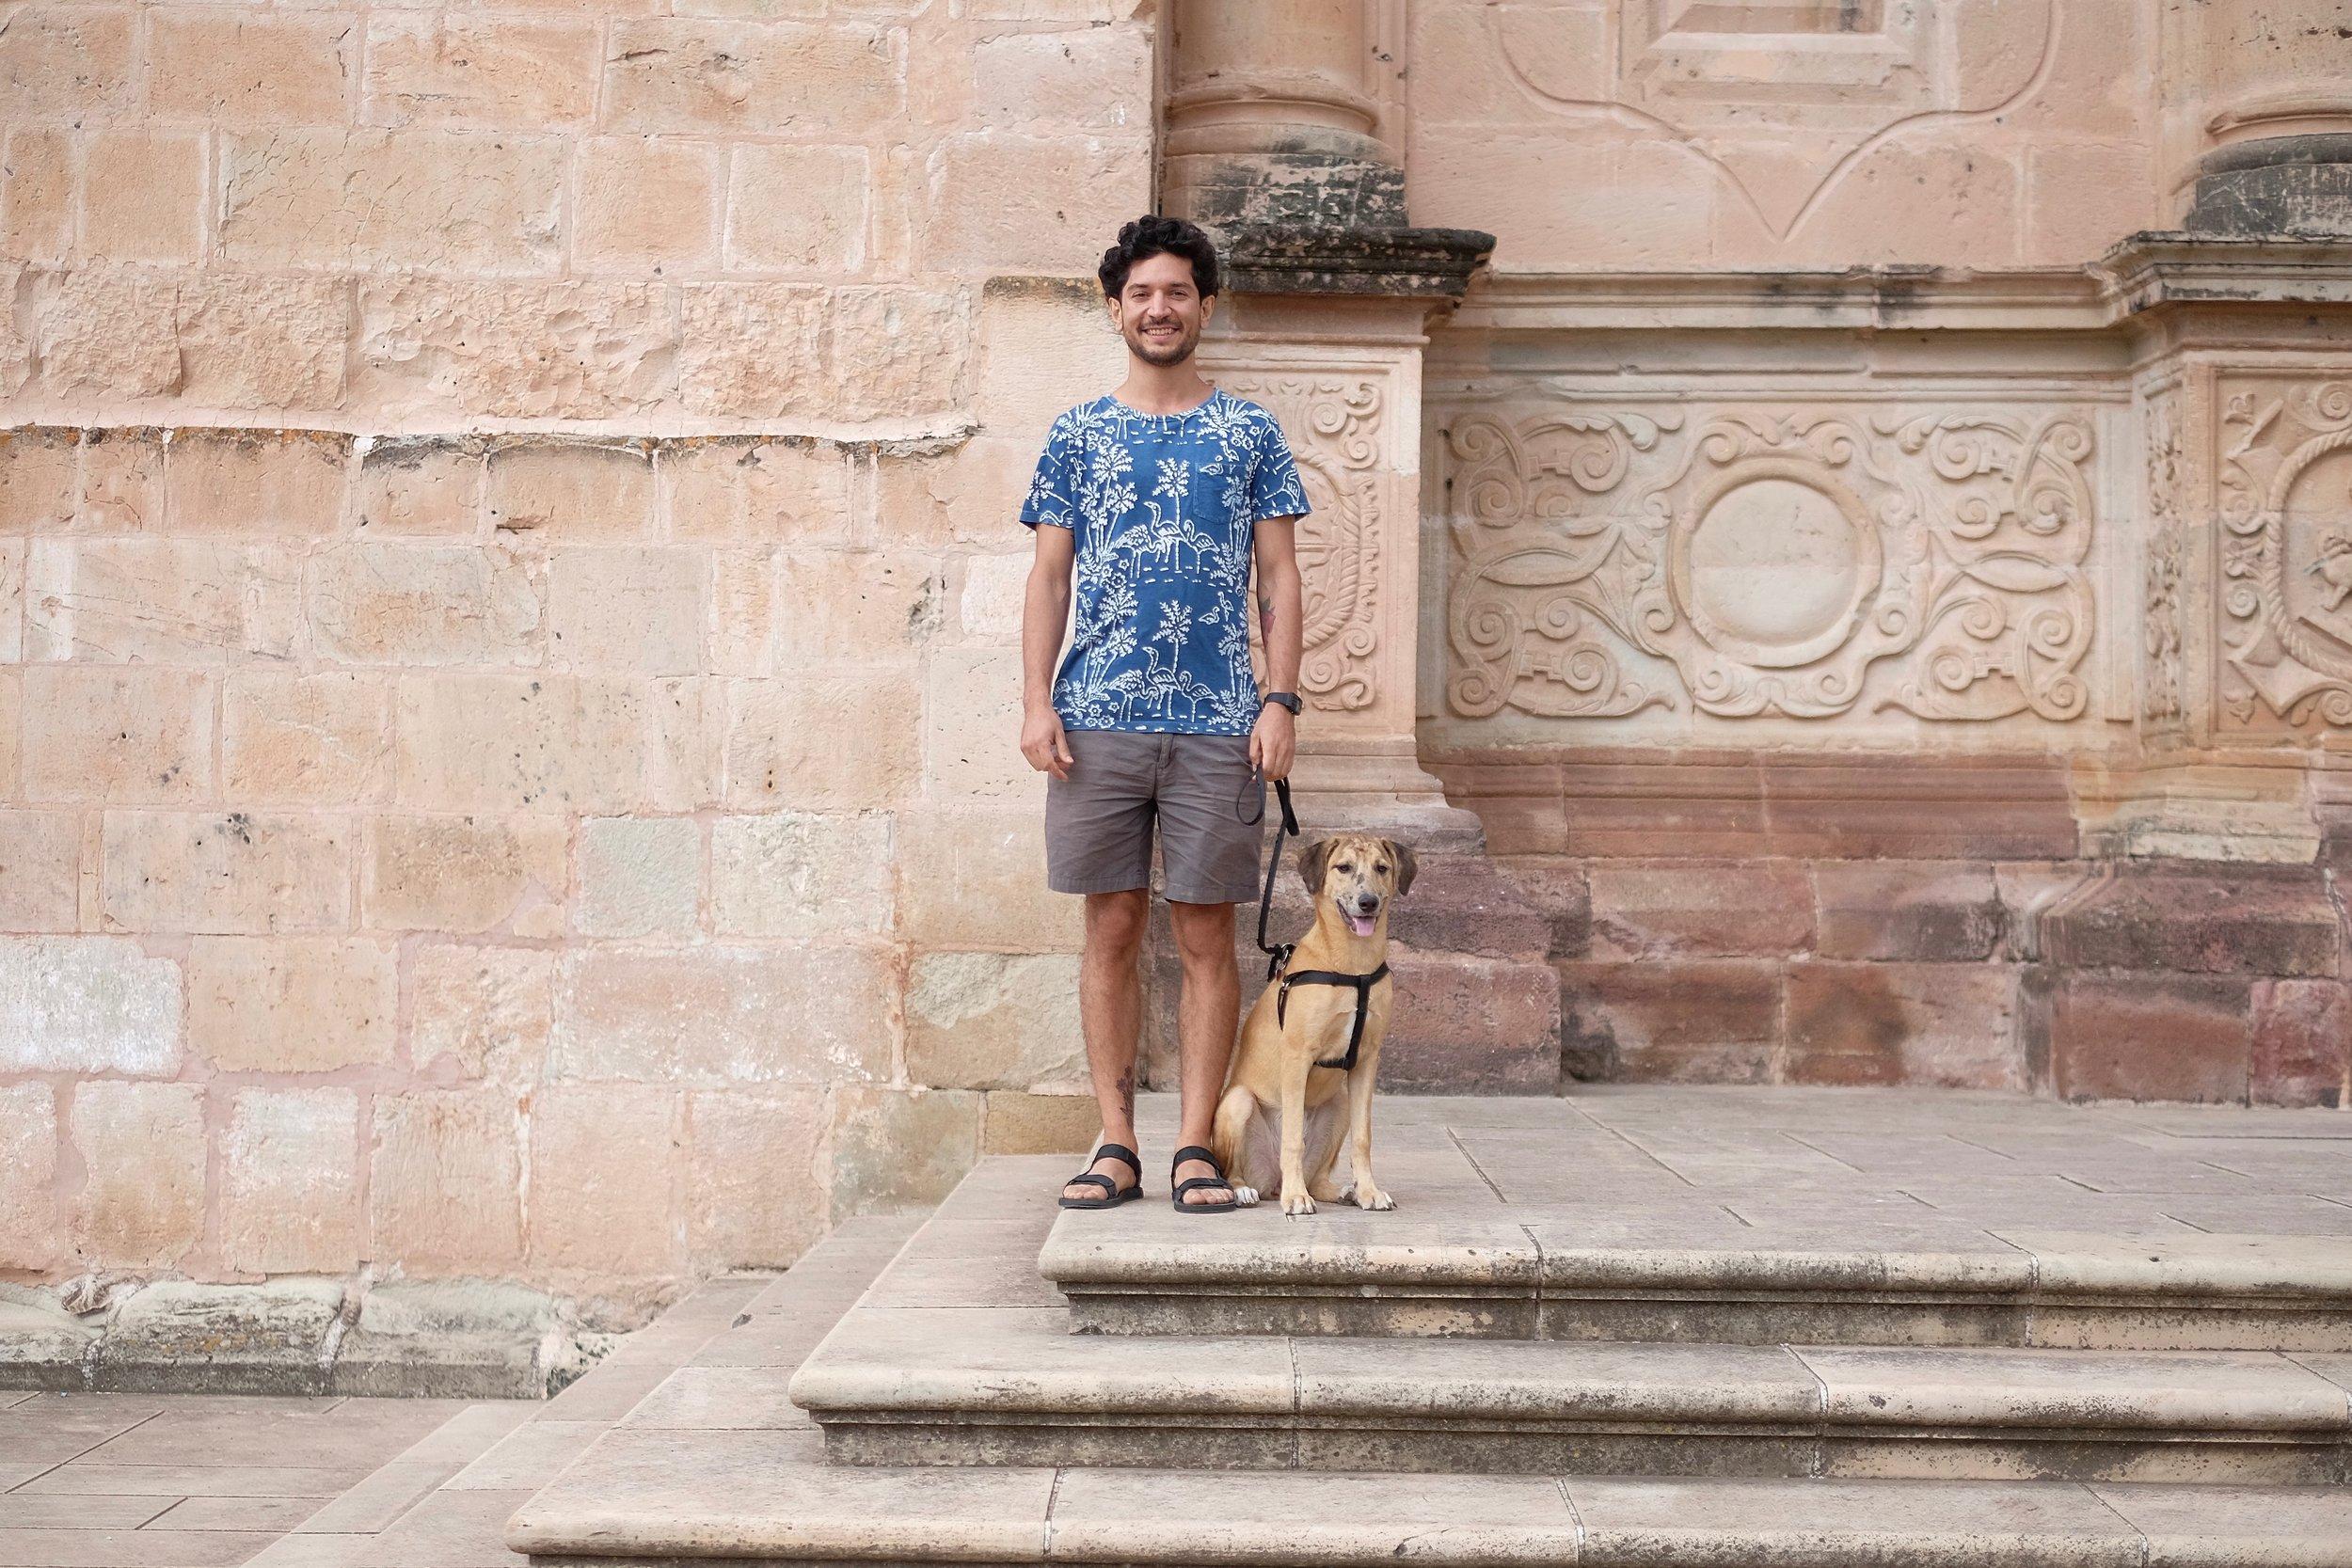 Luis Cardenas and Xia Oaxaca Clay Trip by Thread Caravan